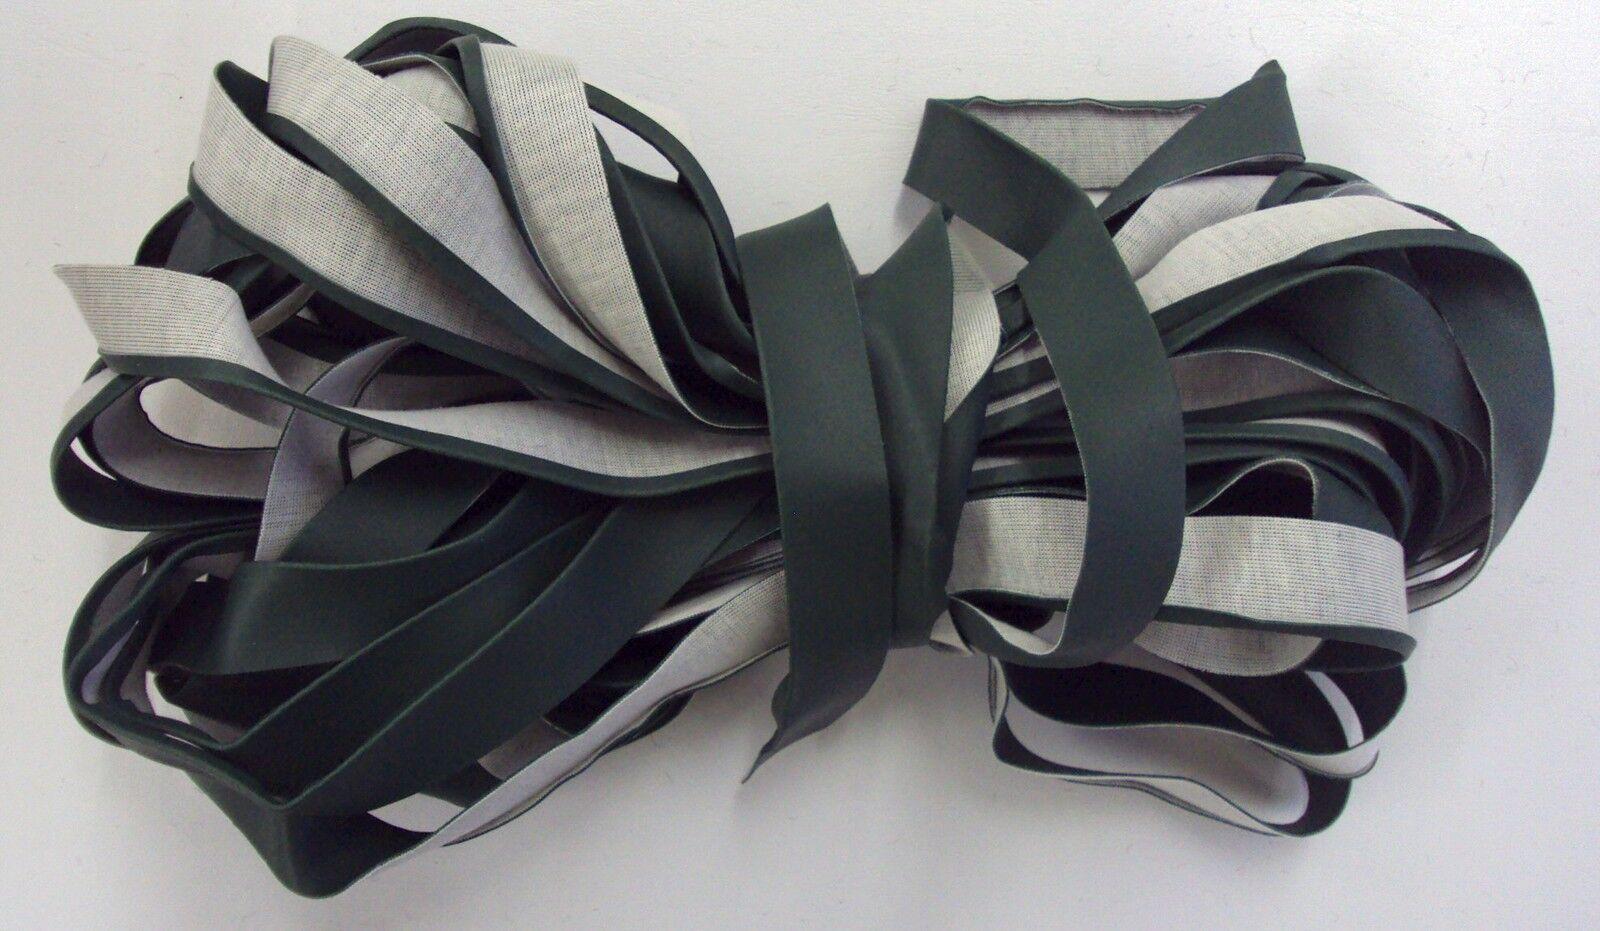 Pin voiture vert moquette bord reliure article en cuir bordure-sew on